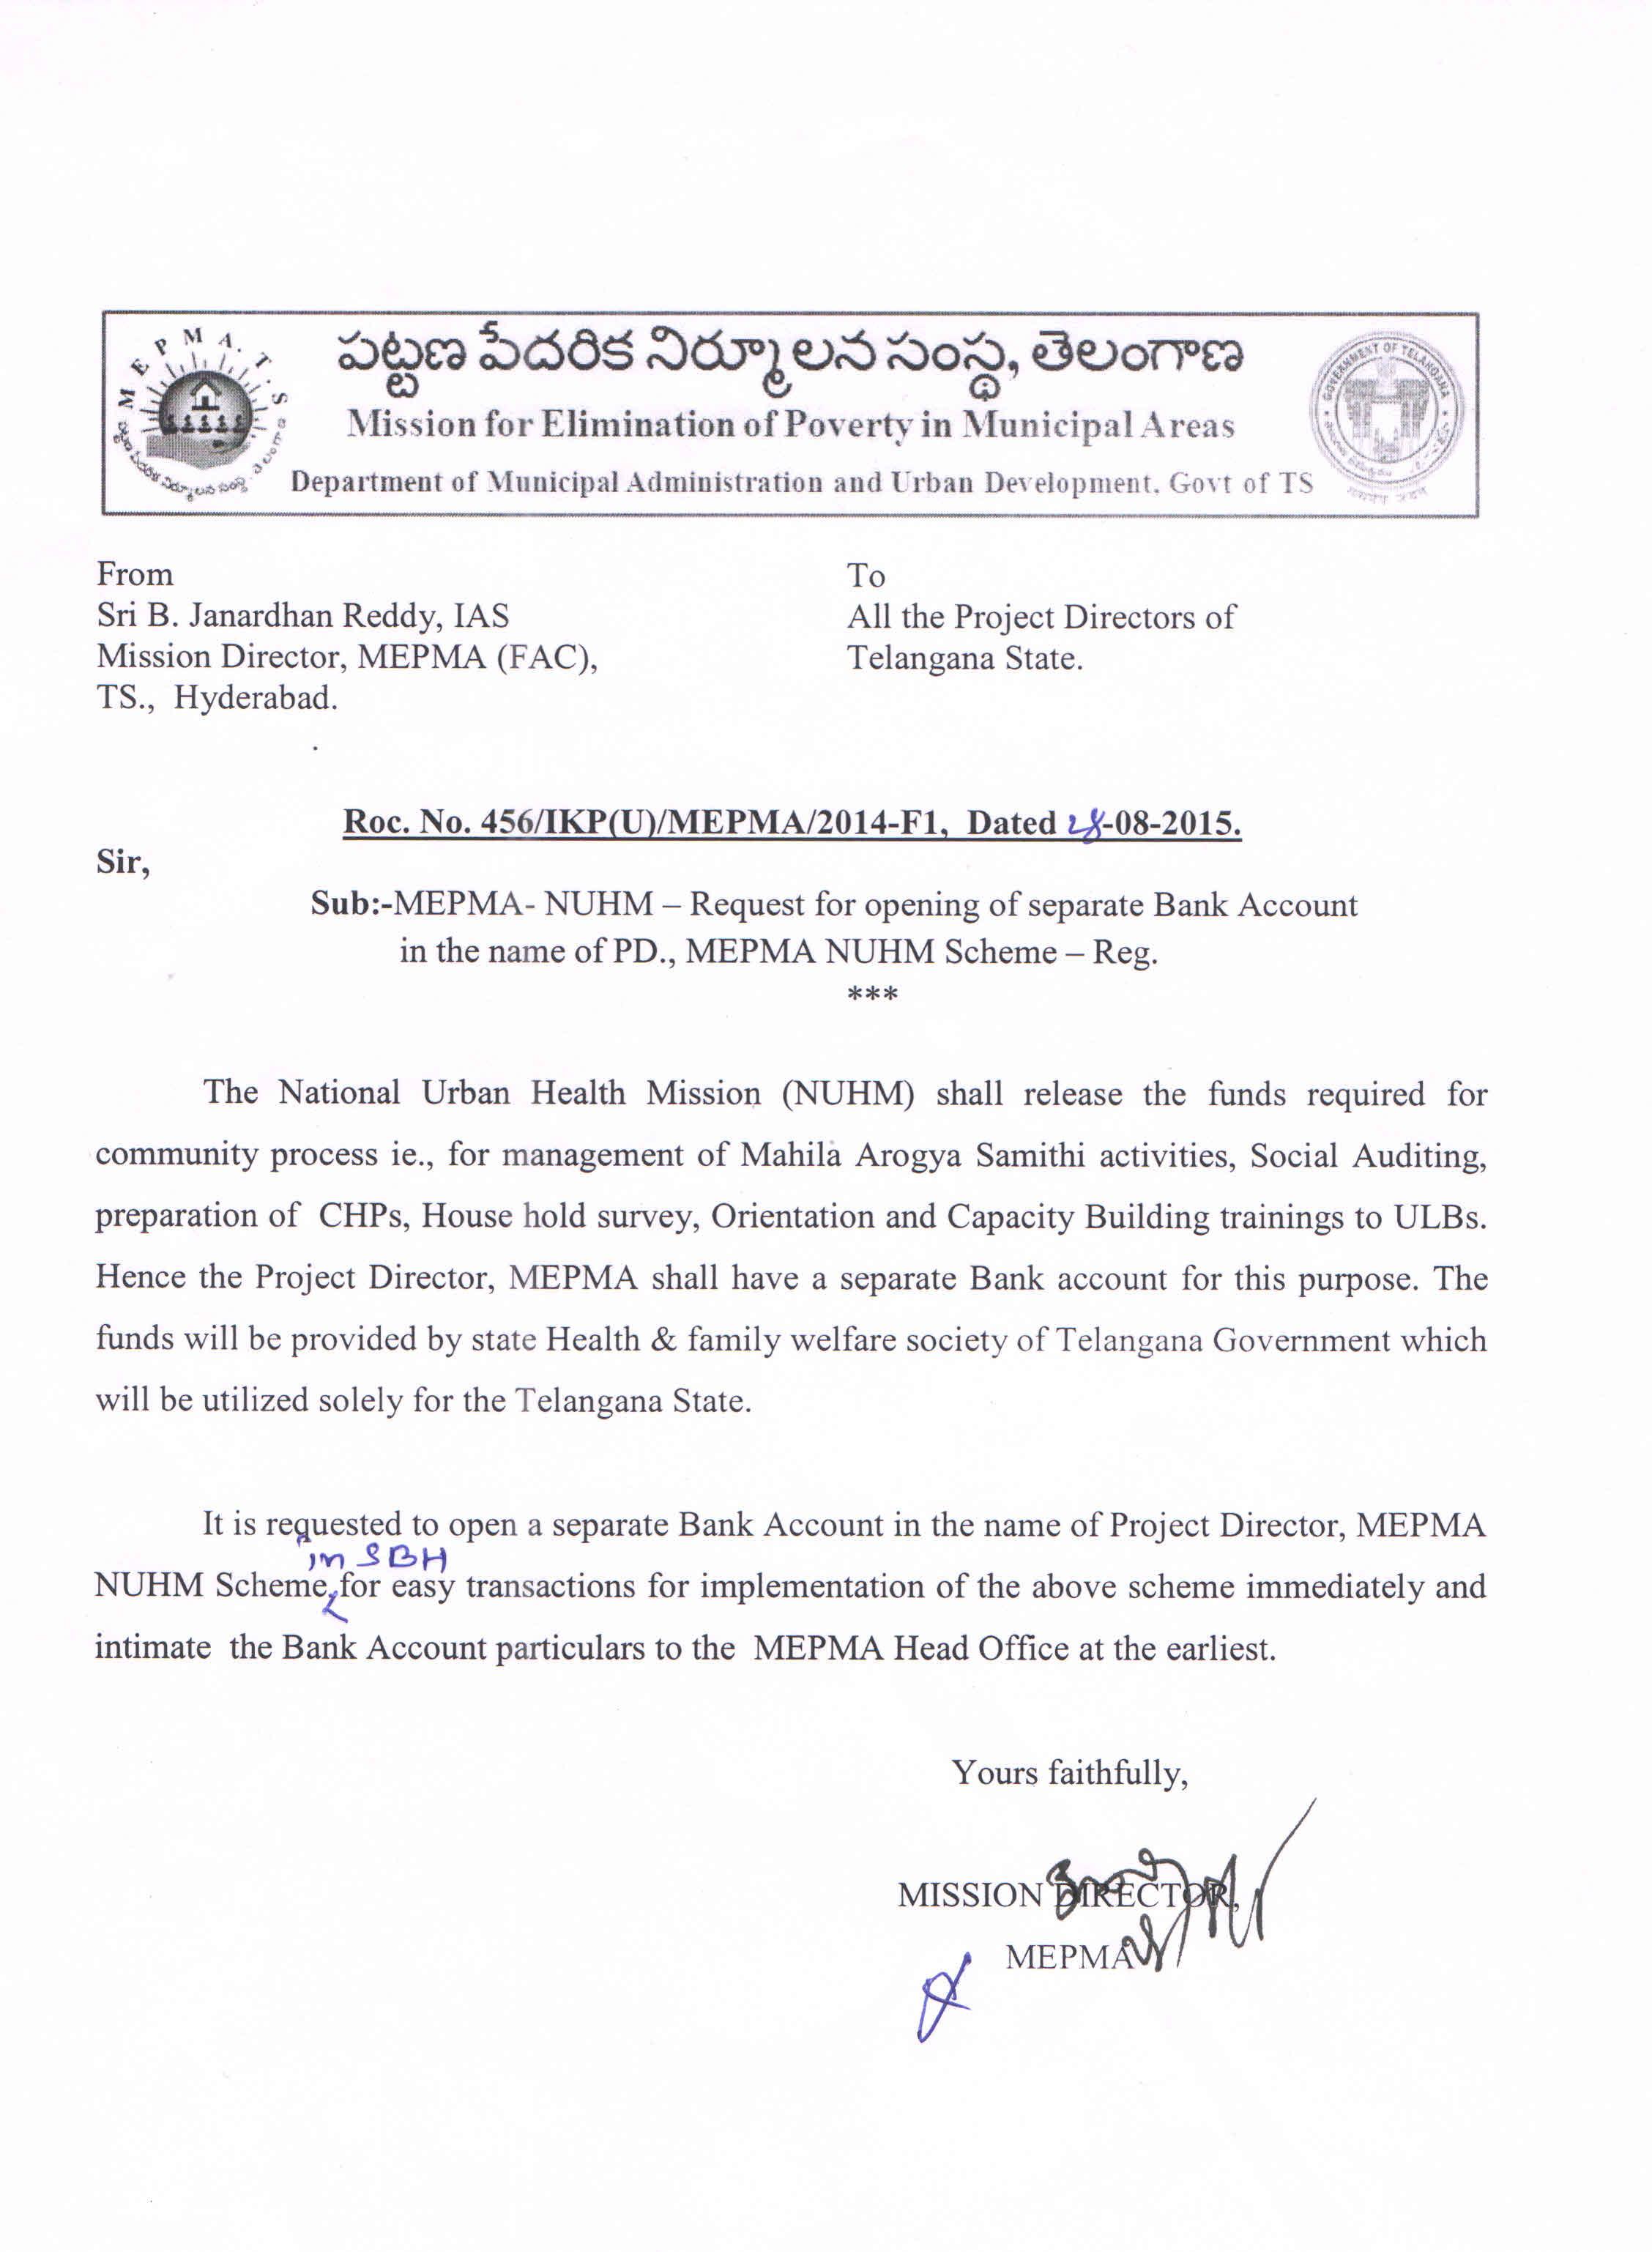 TMEPMA::Telangana State Mission for Elimination of Poverty